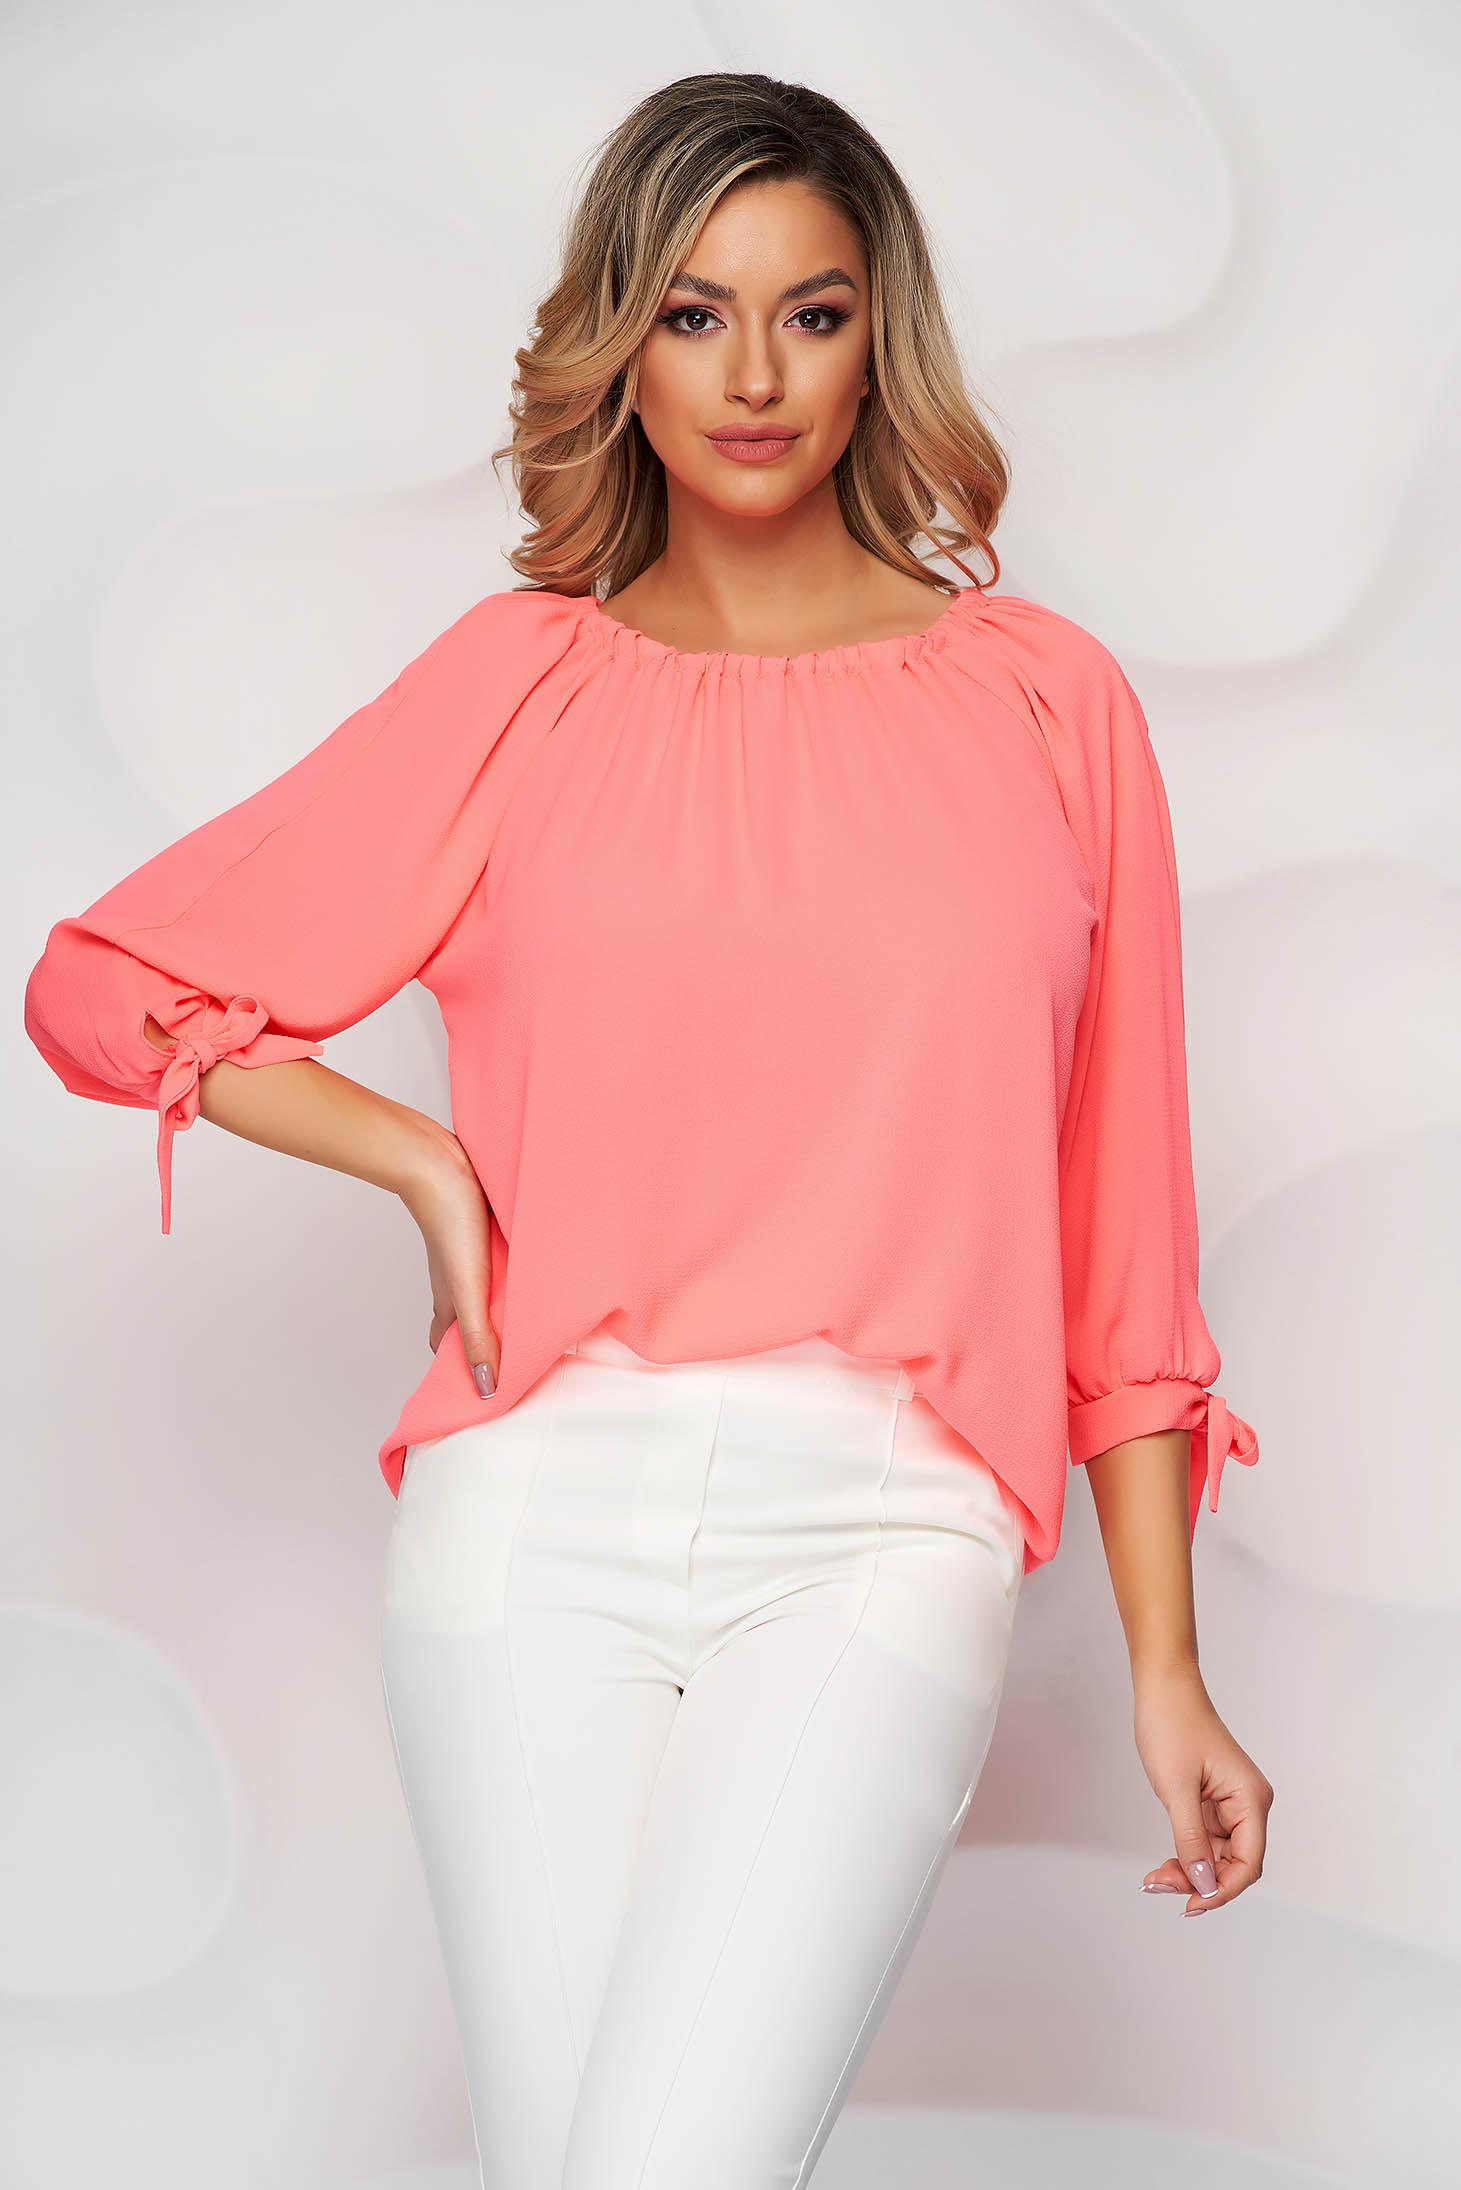 Bluza dama Lady Pandora roz pe umeri din material subtire cu croi larg accesorizata cu fundite